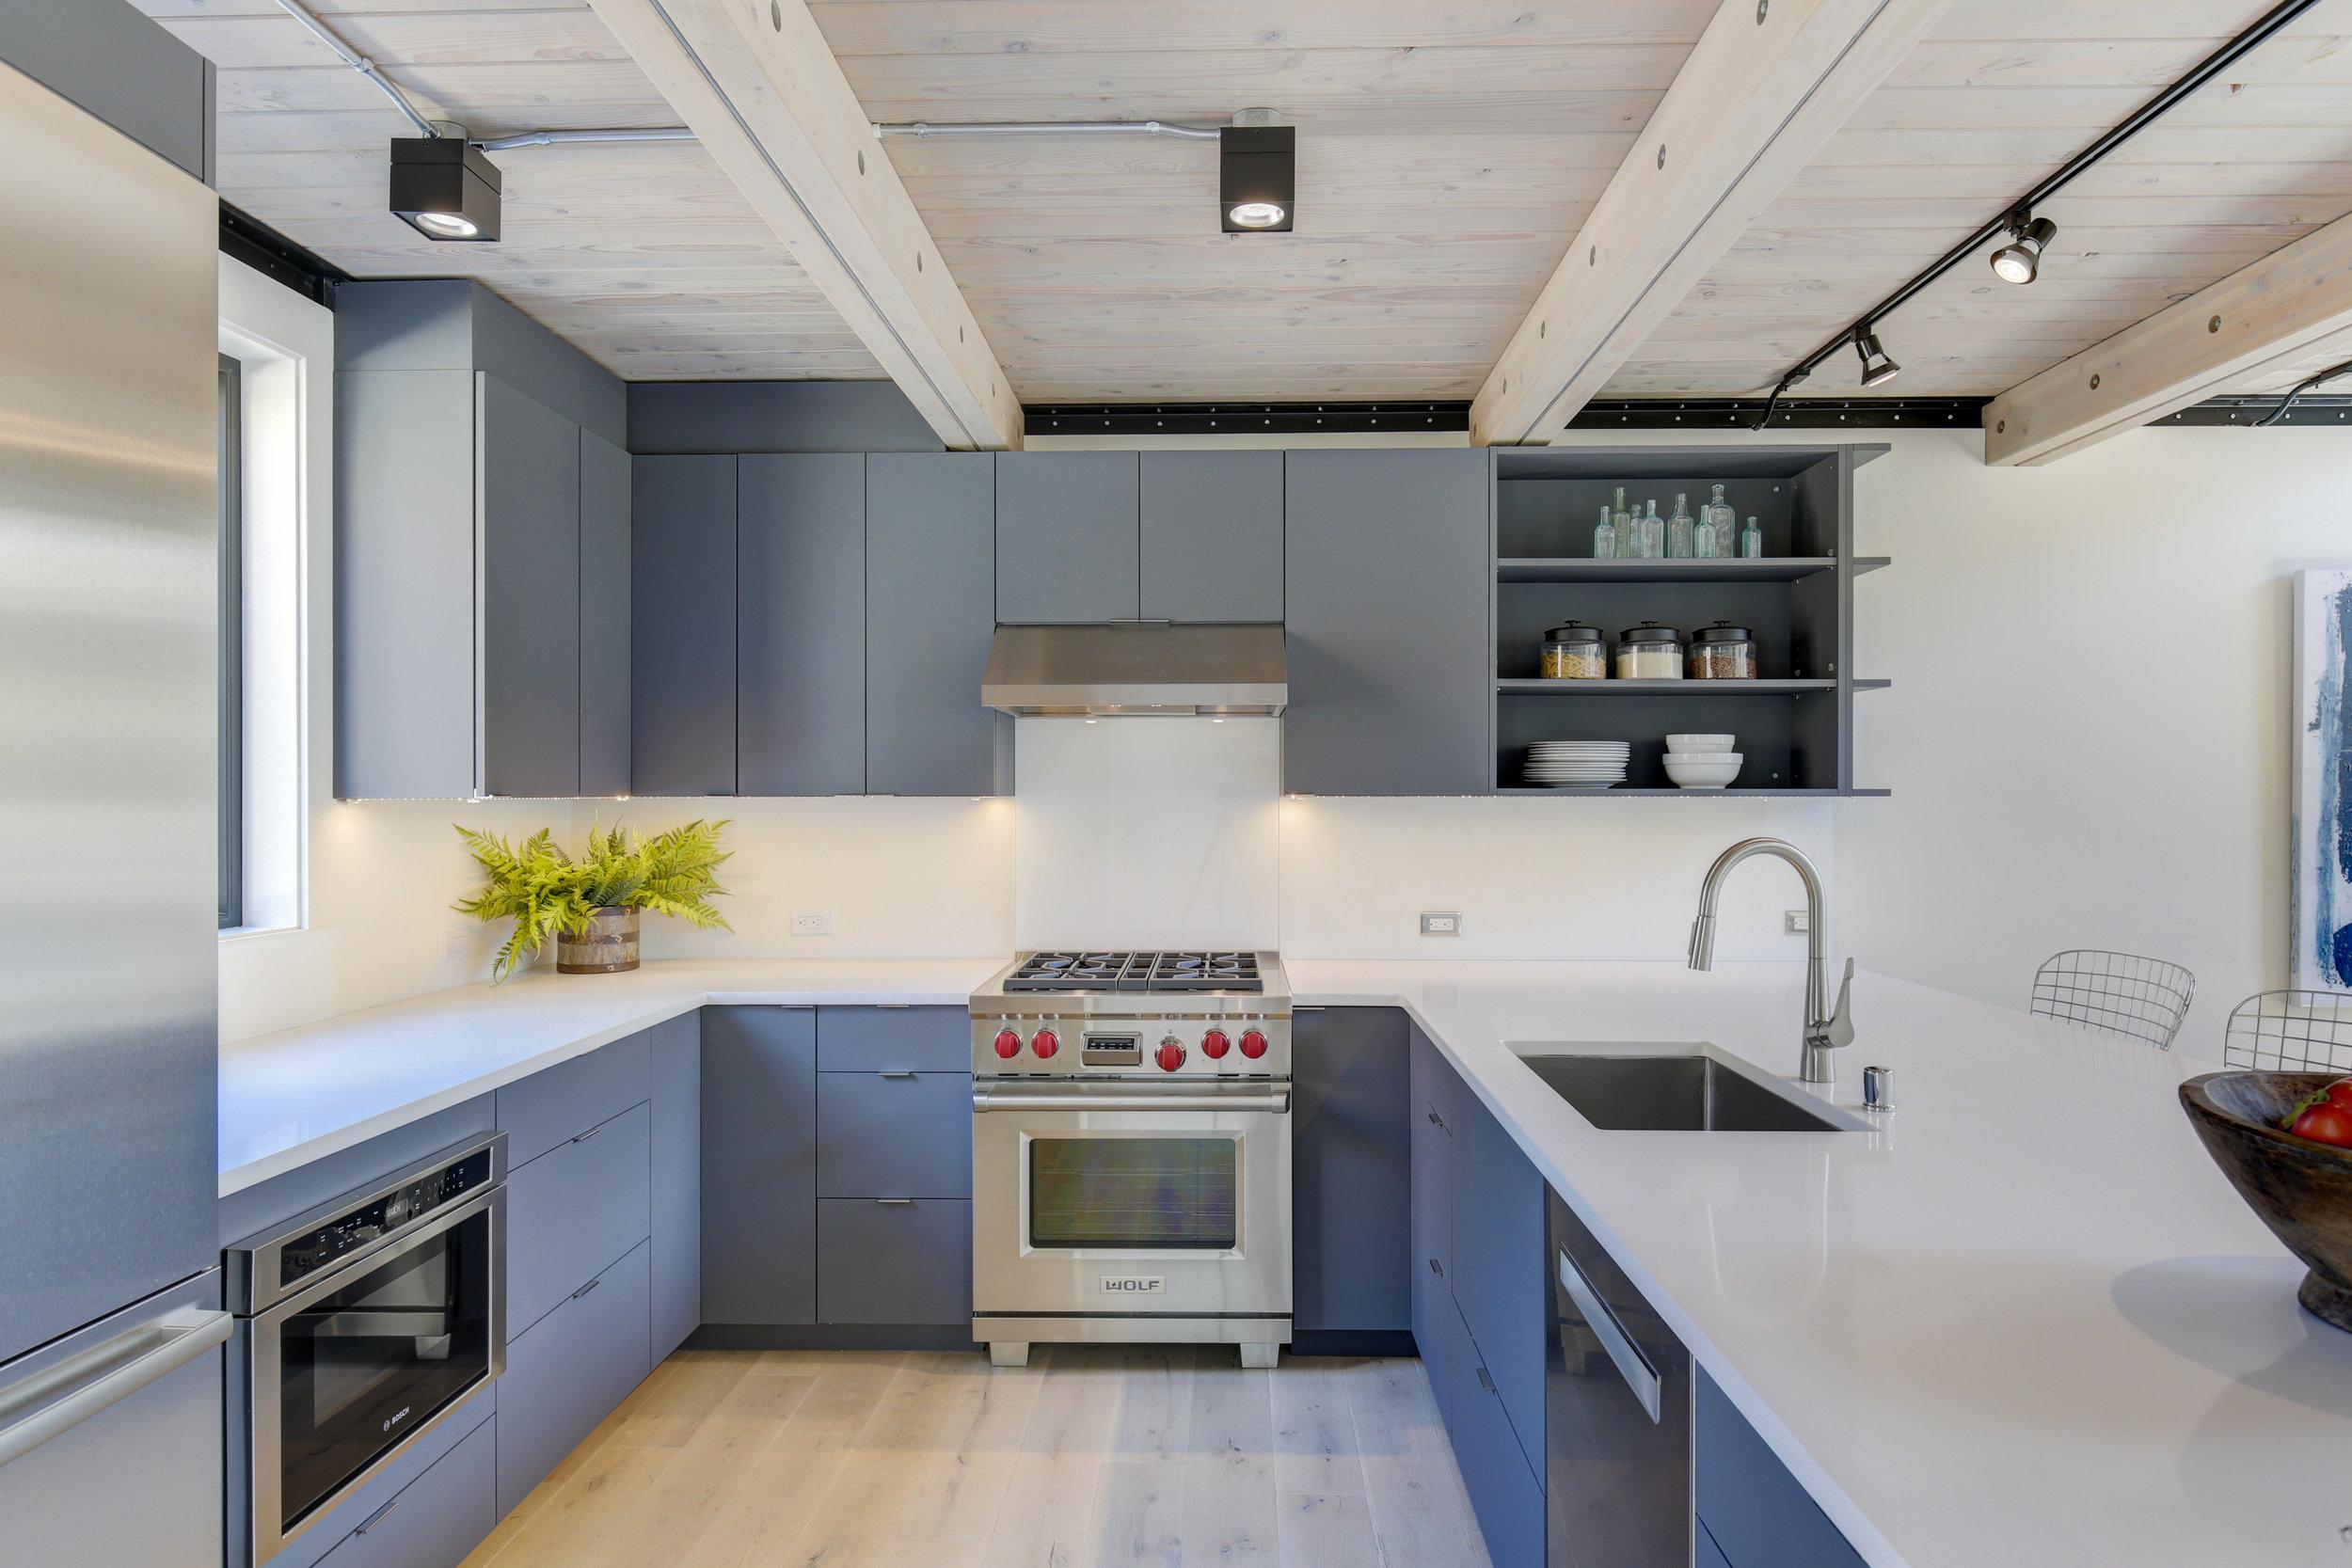 Lee_Street_Lofts_Interior_0005 - Lee Street Lofts - Gourmet Kitchen.jpg